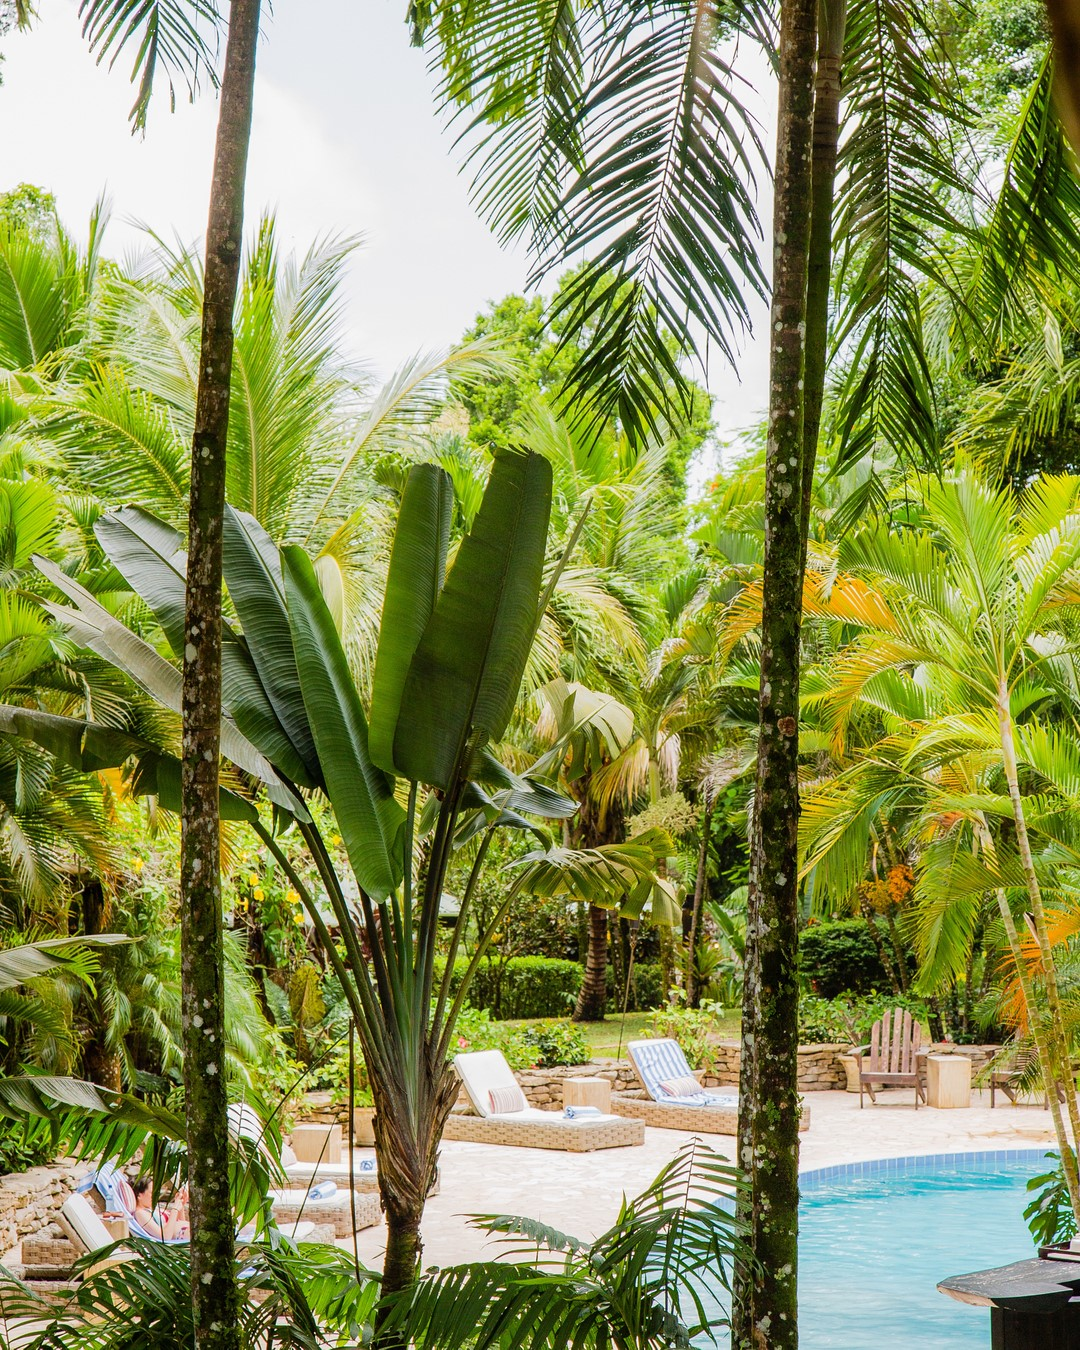 @kfredphoto-copal-tree-lodge-belize-toledo-pool